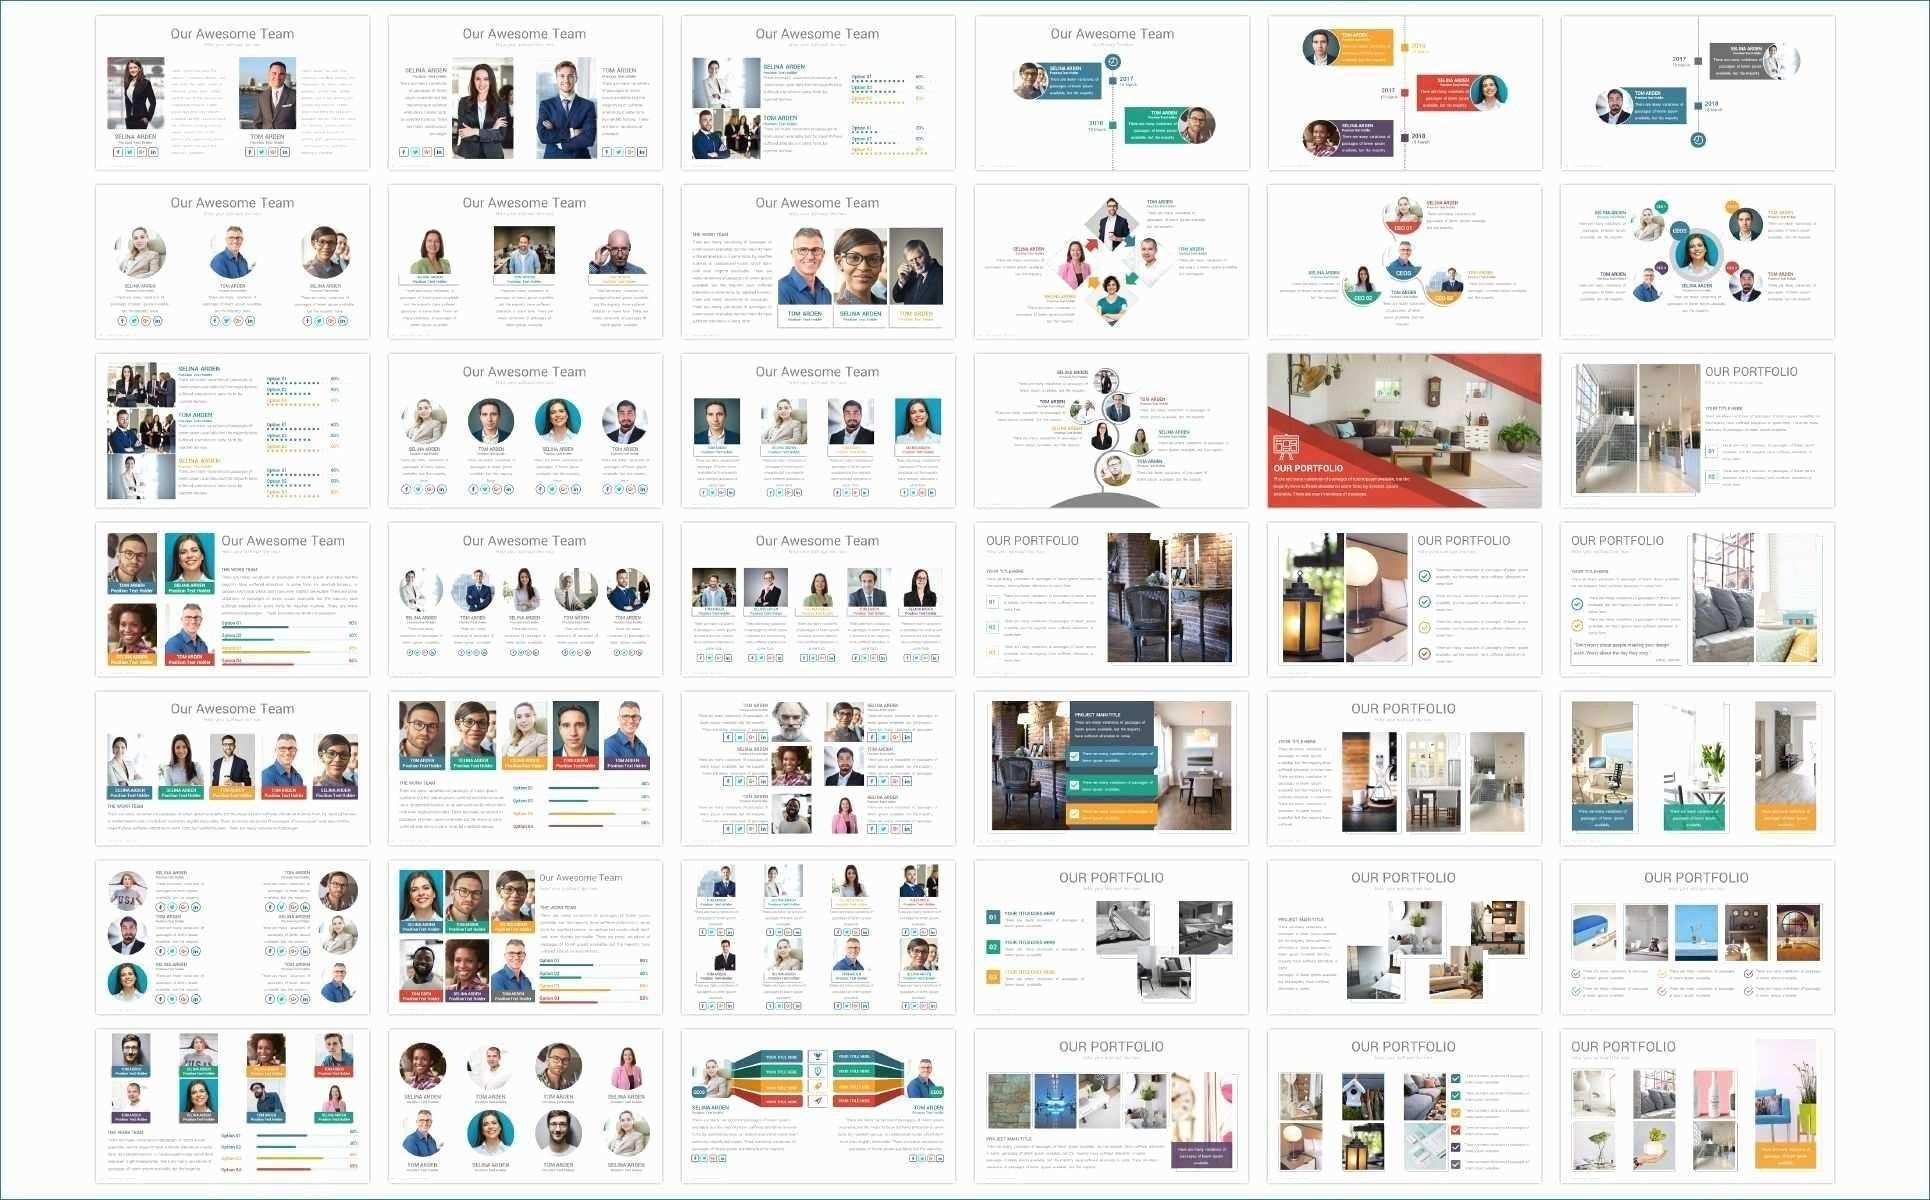 Portfolio Template Ppt Free Download Interior Design Portfolio Templates From Portfo Portfolio Template Design Free Portfolio Template Portfolio Templates